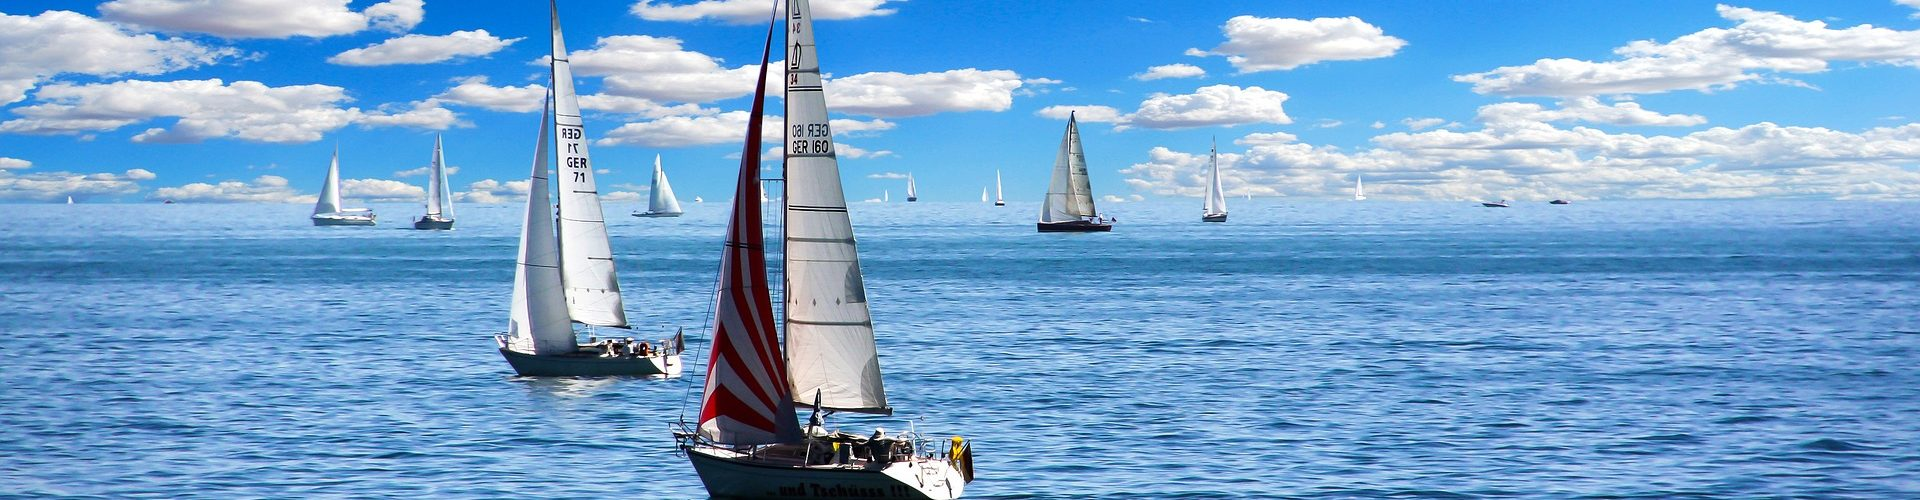 segeln lernen in Sankt Peter Ording segelschein machen in Sankt Peter Ording 1920x500 - Segeln lernen in Sankt Peter-Ording